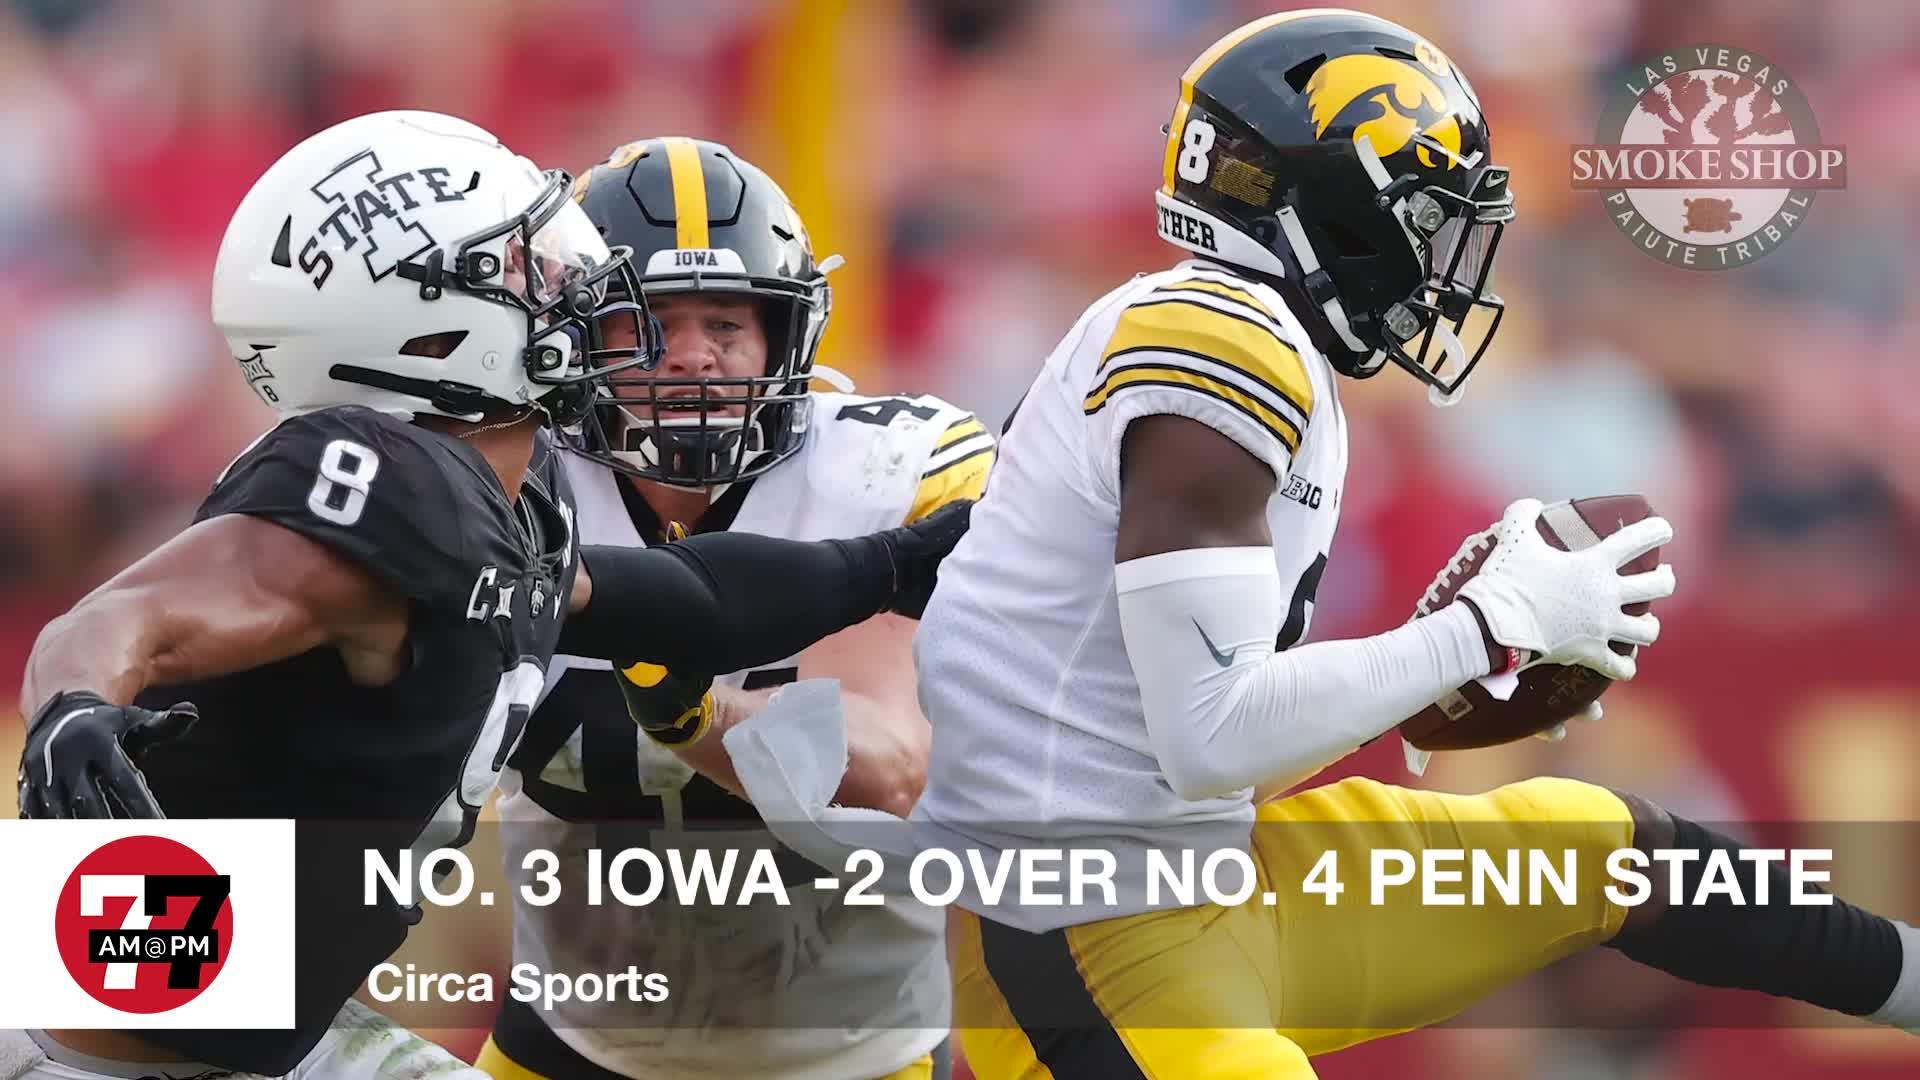 7@7PM Iowa -2 Over Penn State